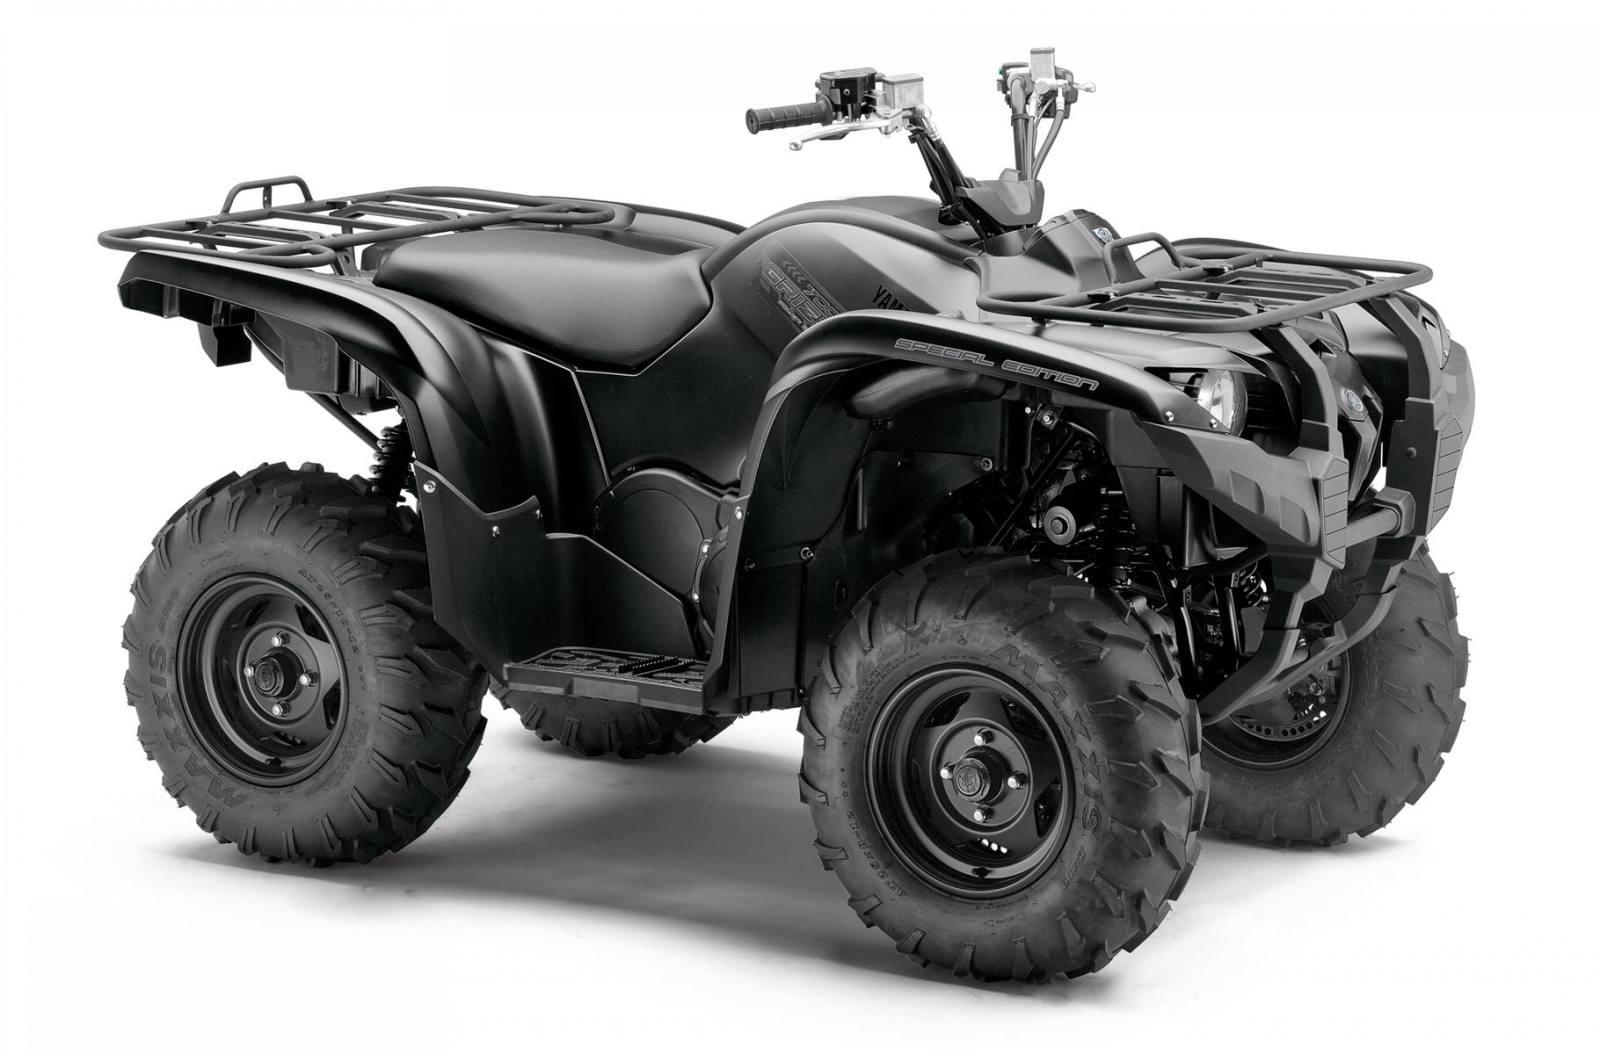 Yamaha grizzly 700 price australia